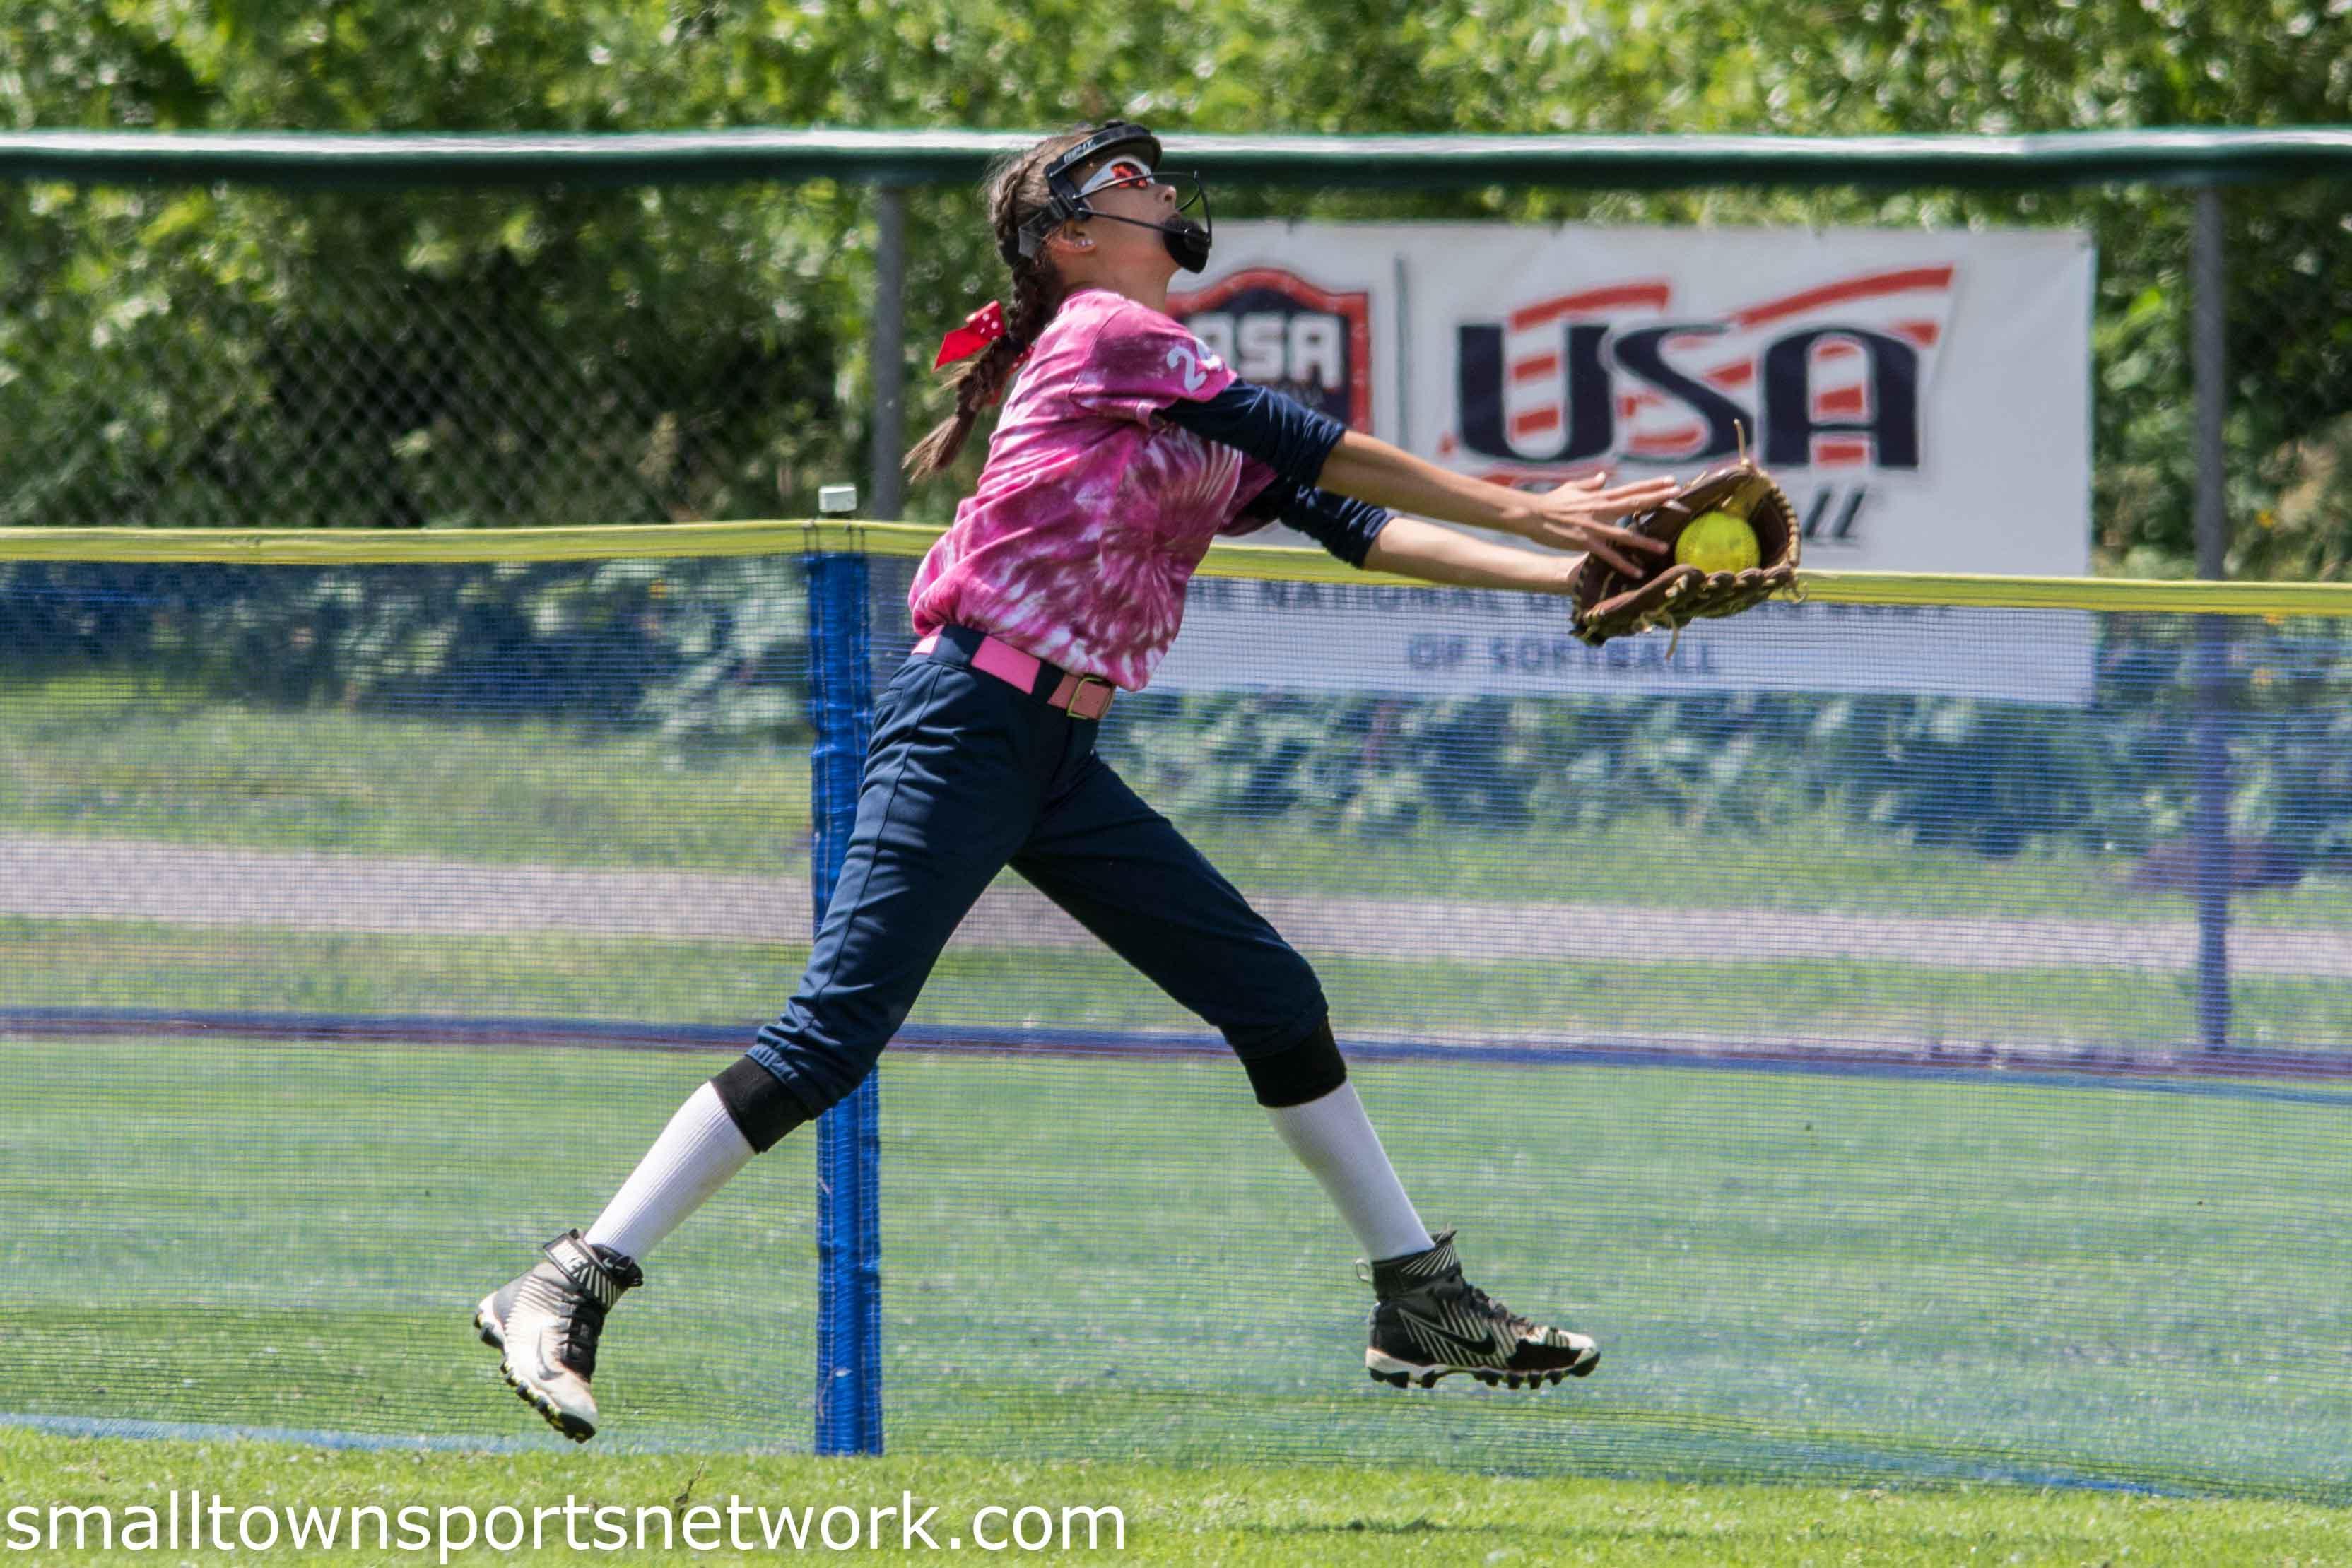 Reach for the Stars Softball Tournament